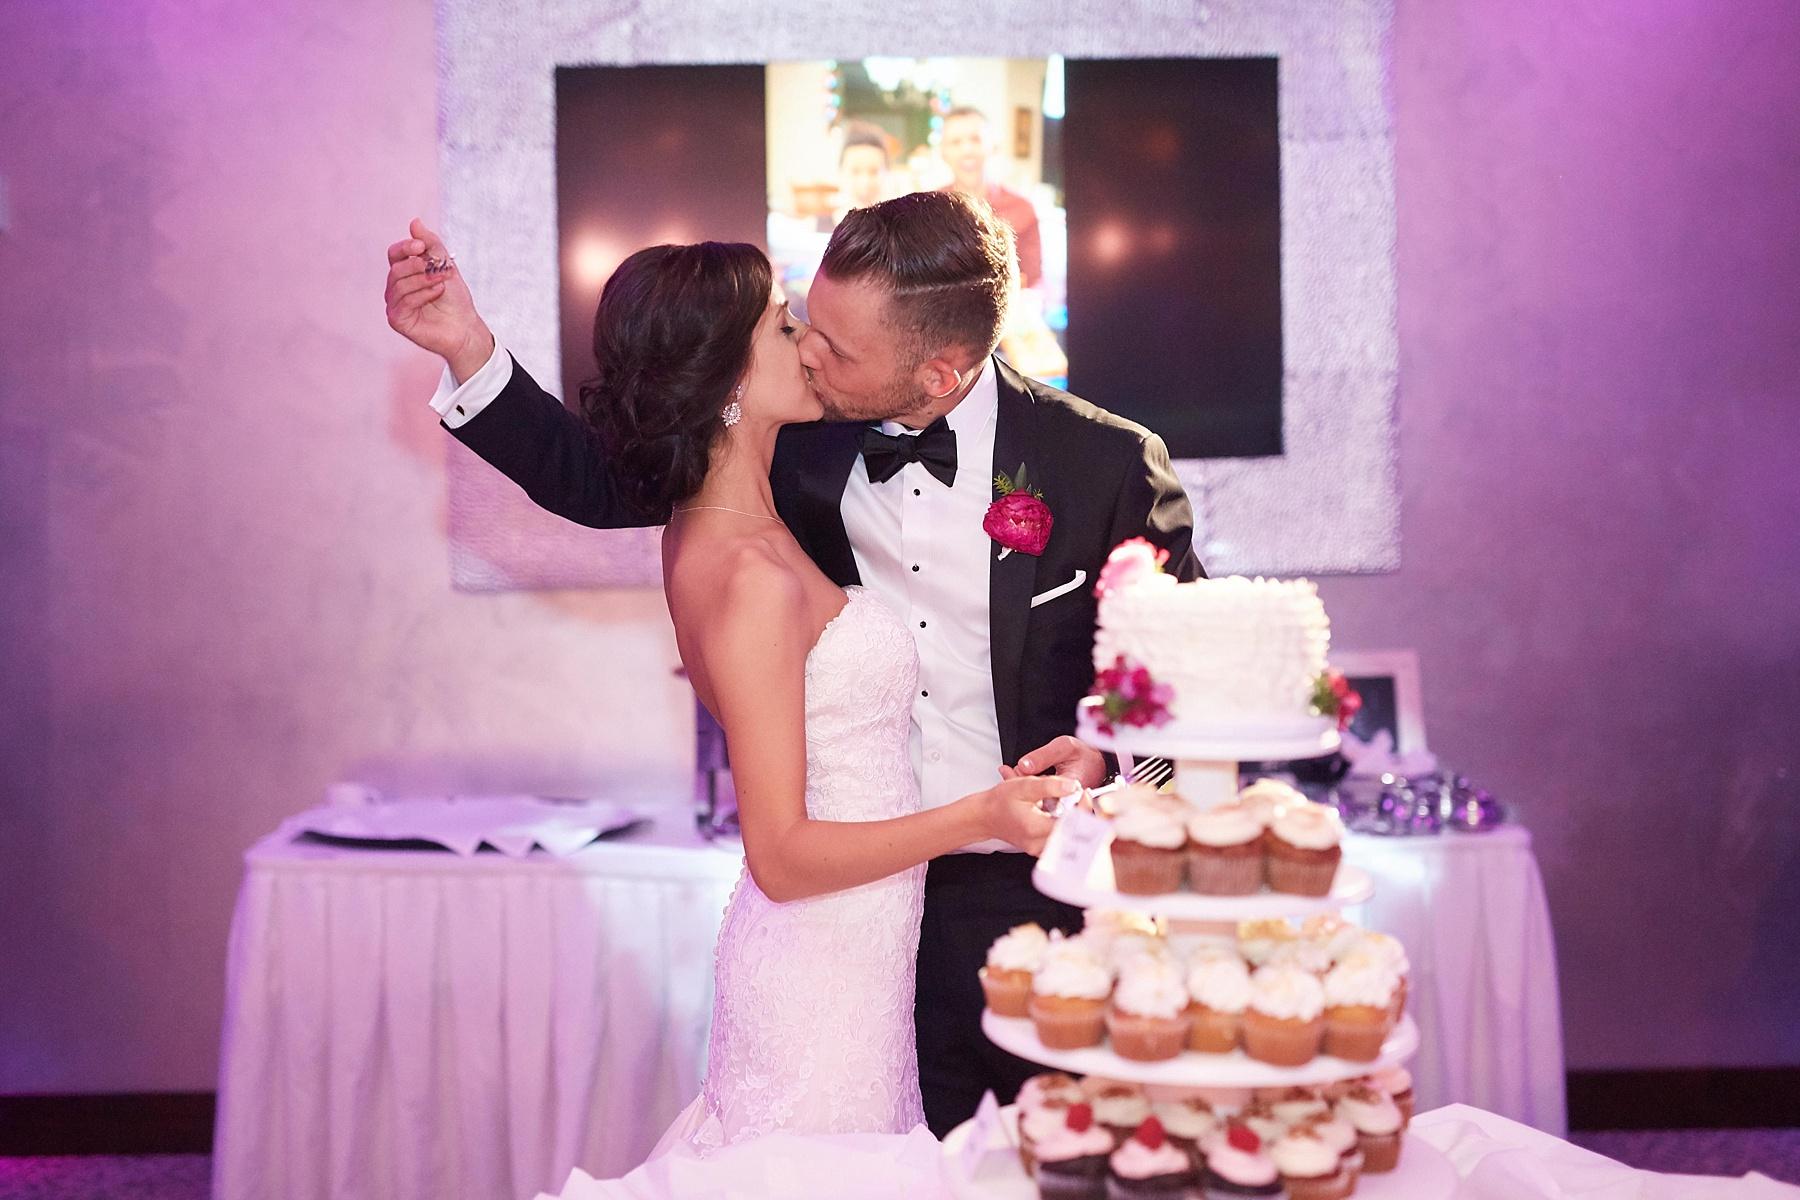 ABULAE-Wedding-Saint-paul-MN-Josh-Sofia-Wedding-Mears-Park_0854.jpg